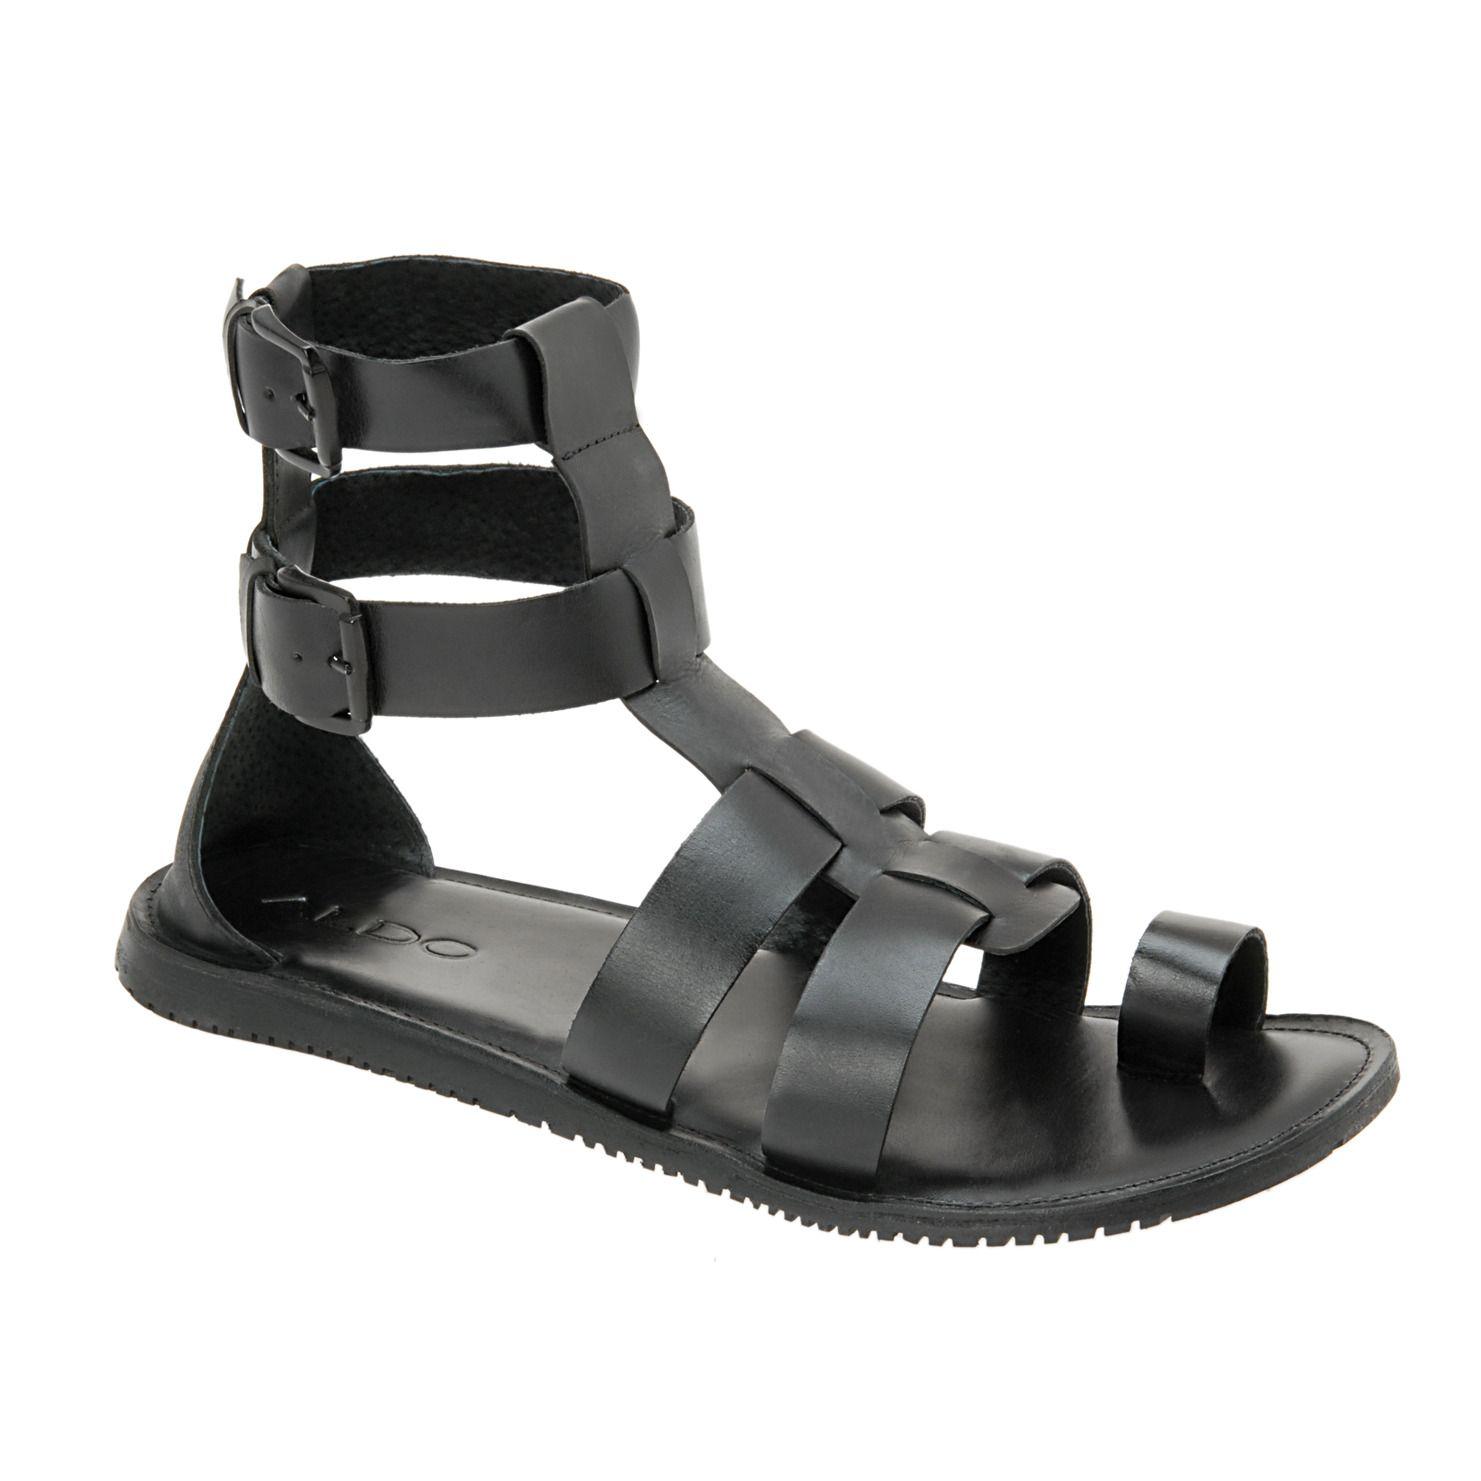 Sandals shoes sale - Gyllensten Men S Sandals For Sale At Aldo Shoes